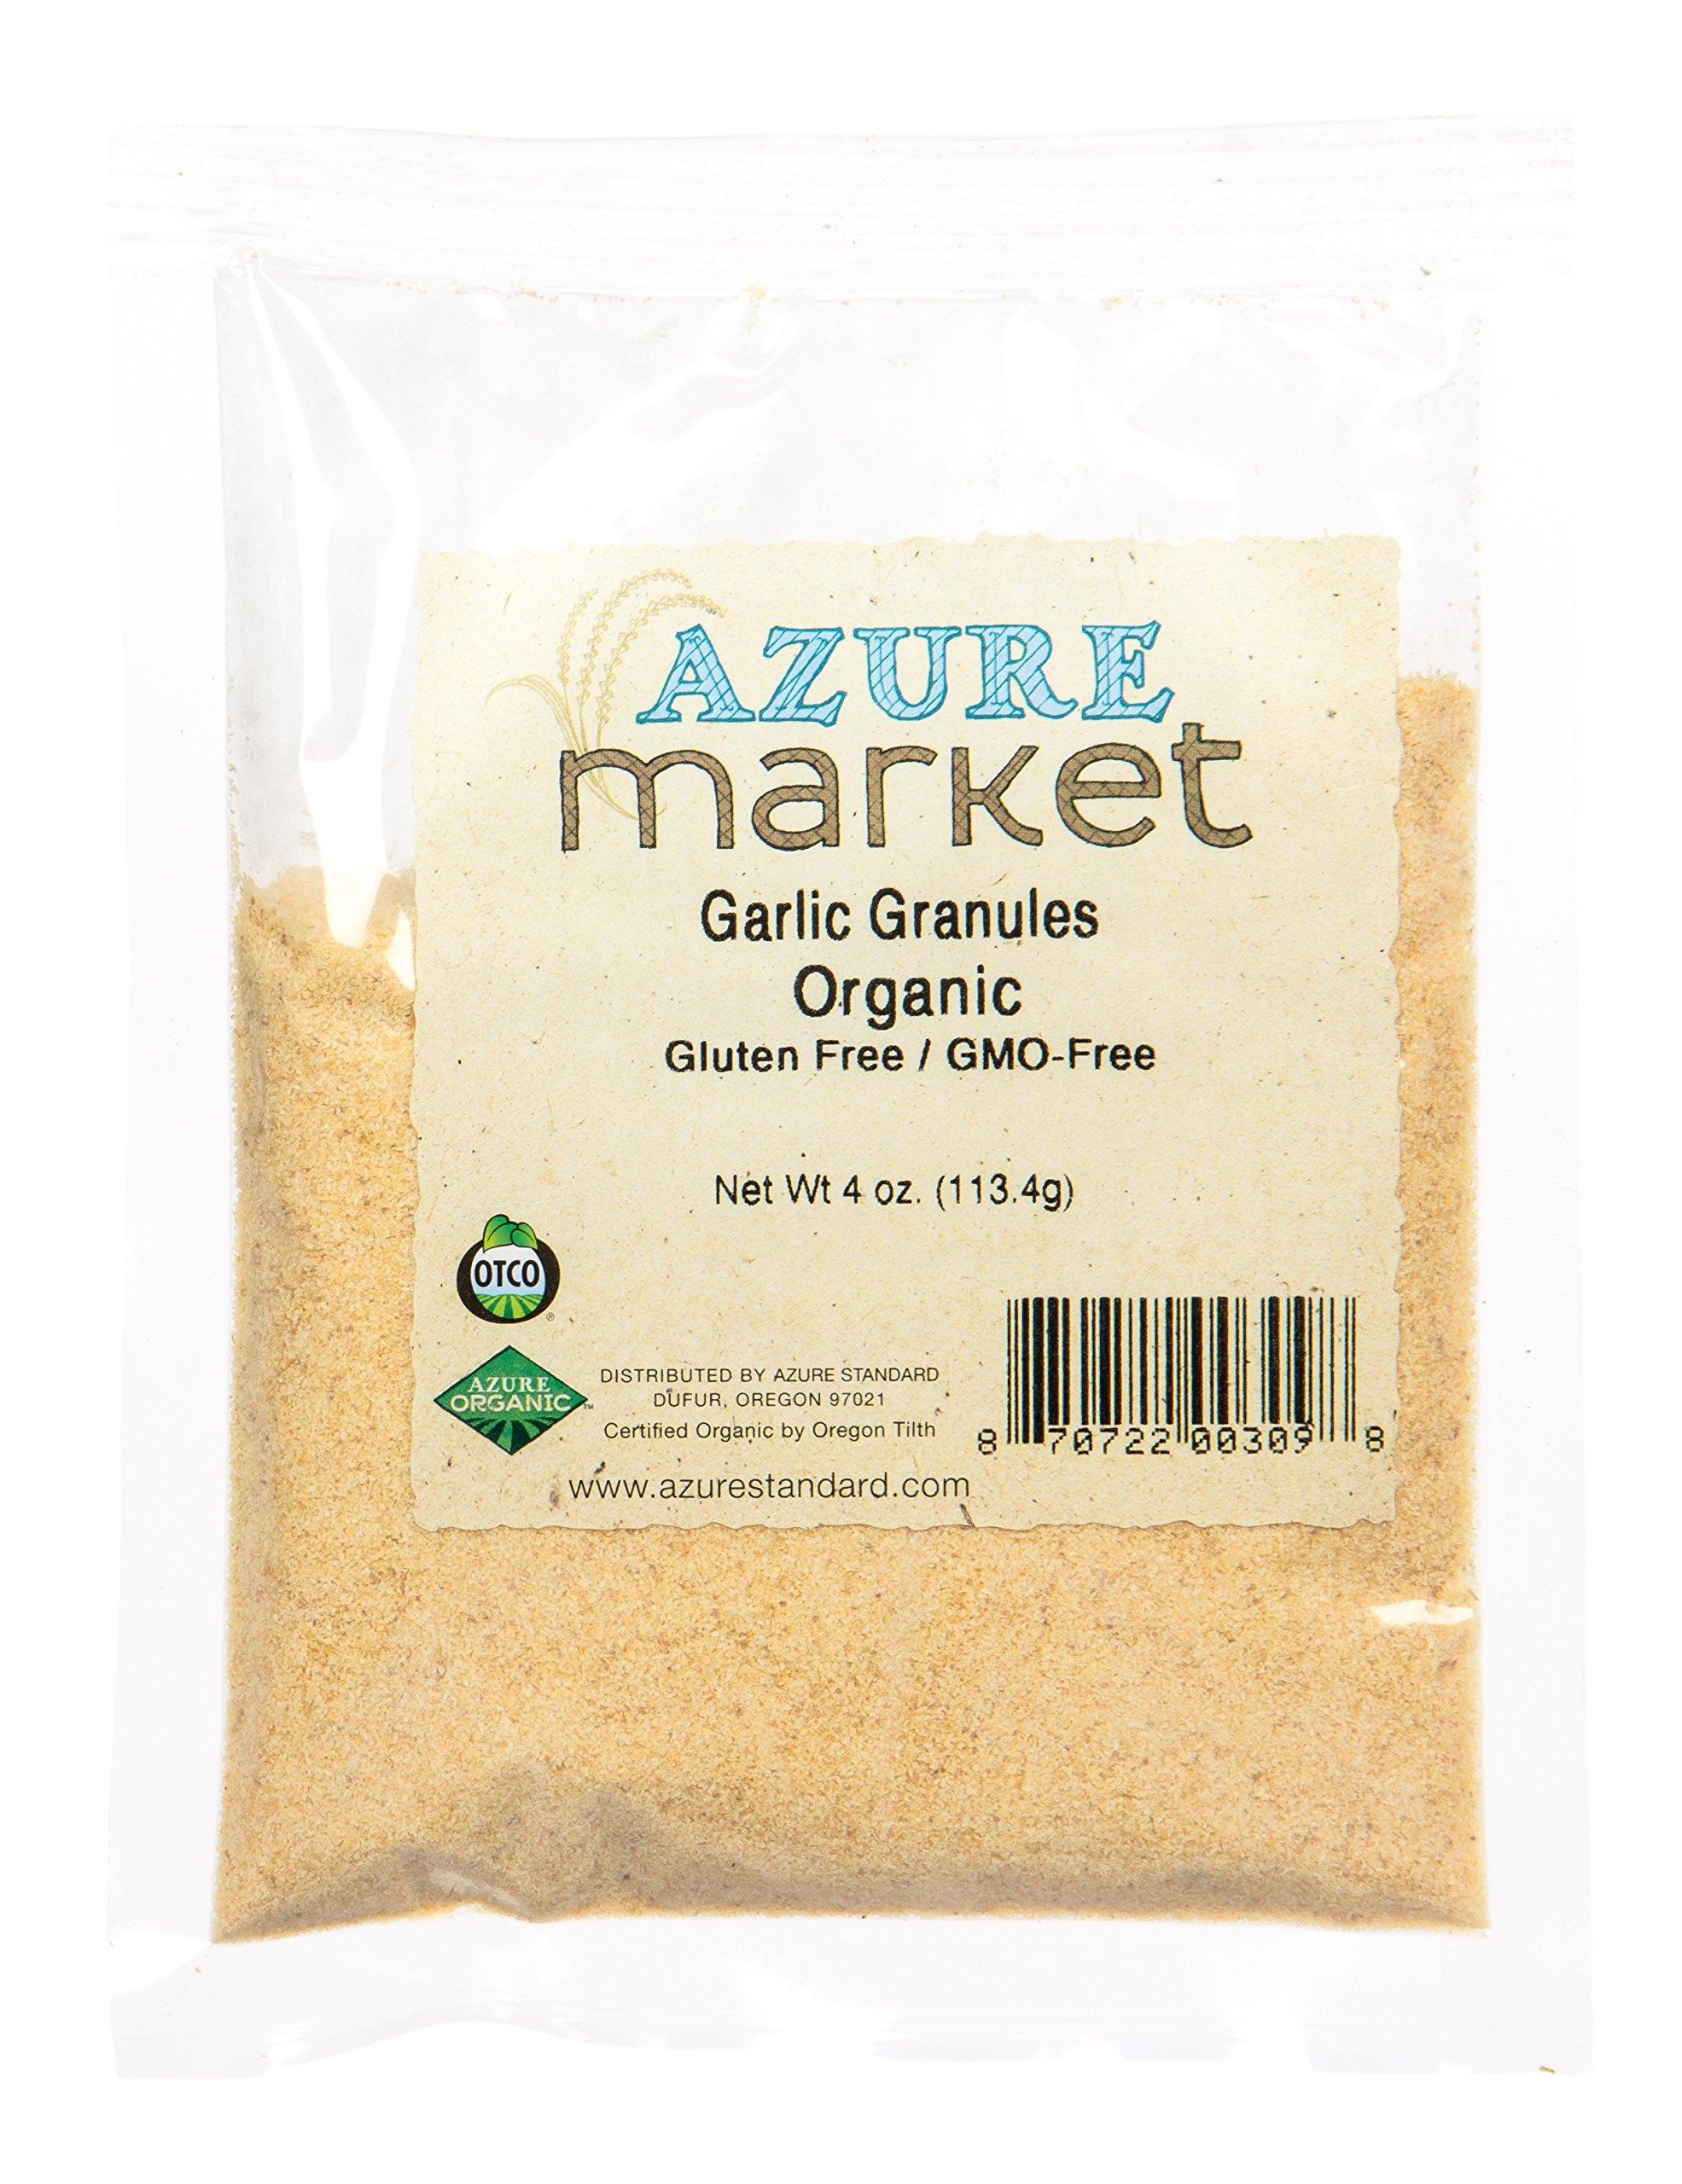 Azure Market Organics Garlic Granules, Organic - 4 oz